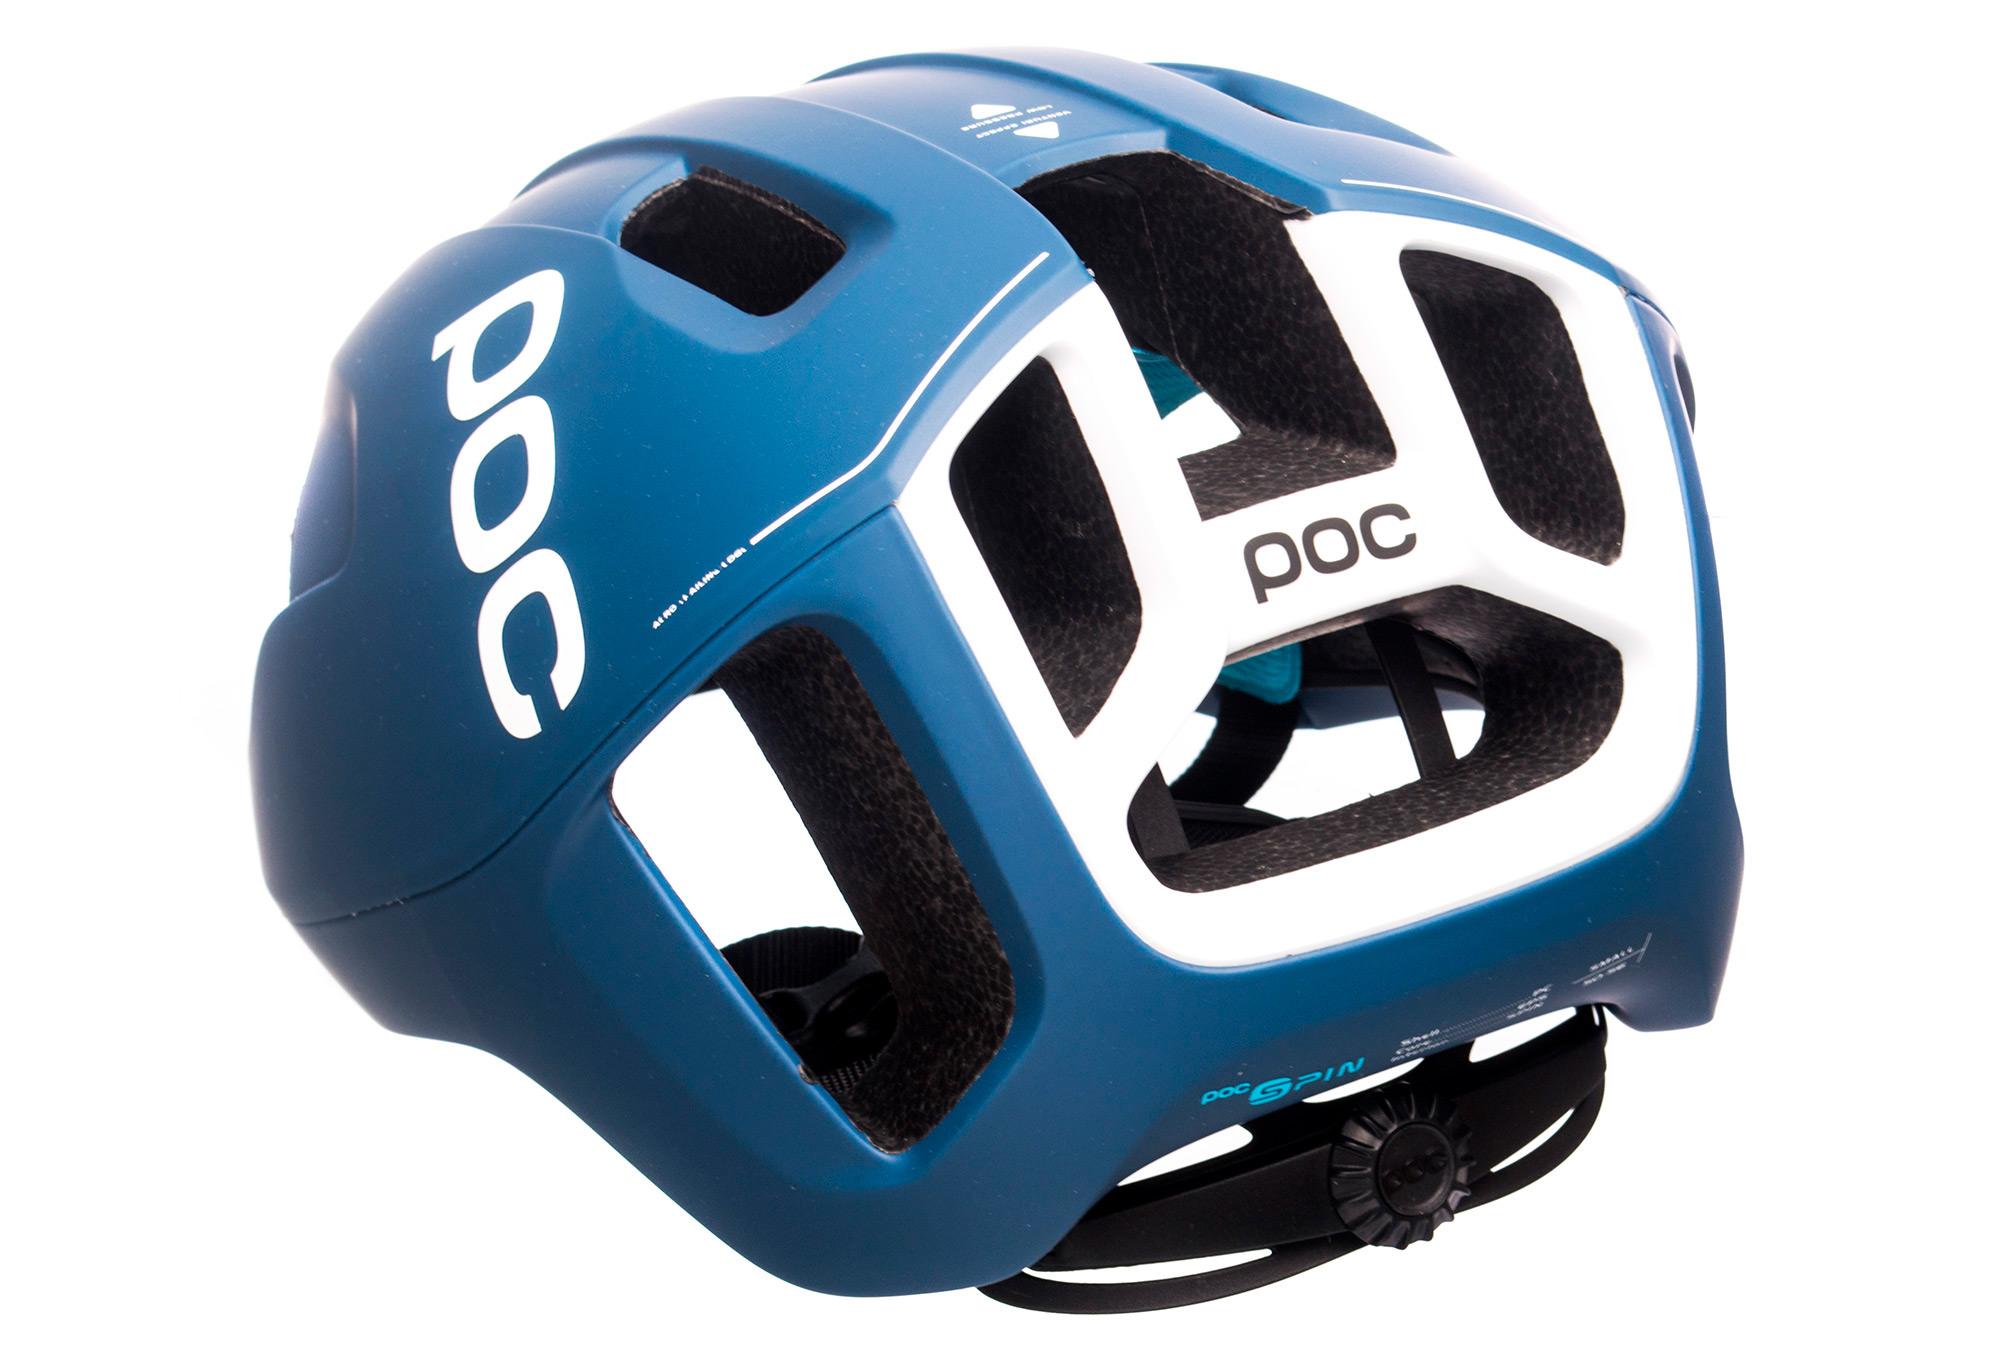 POC Octal Aero CPSC Casque vélo Bleu Marine Noir-Medium 54-60 cm